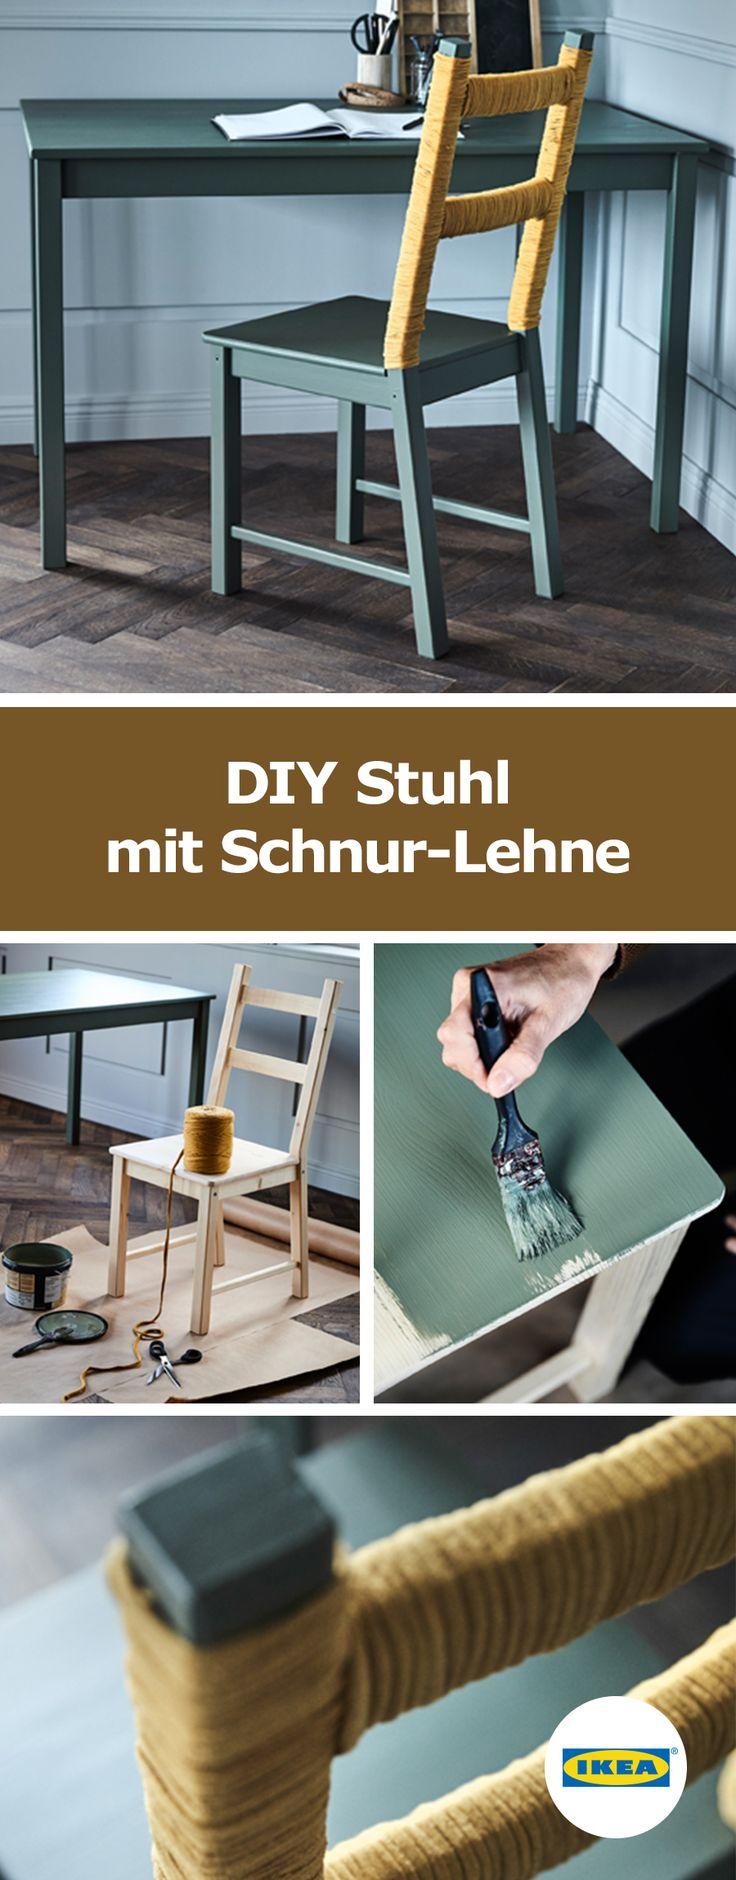 33 besten ikea diy ideen bilder auf pinterest ikea deutschland diy ideen und ikea hacks. Black Bedroom Furniture Sets. Home Design Ideas